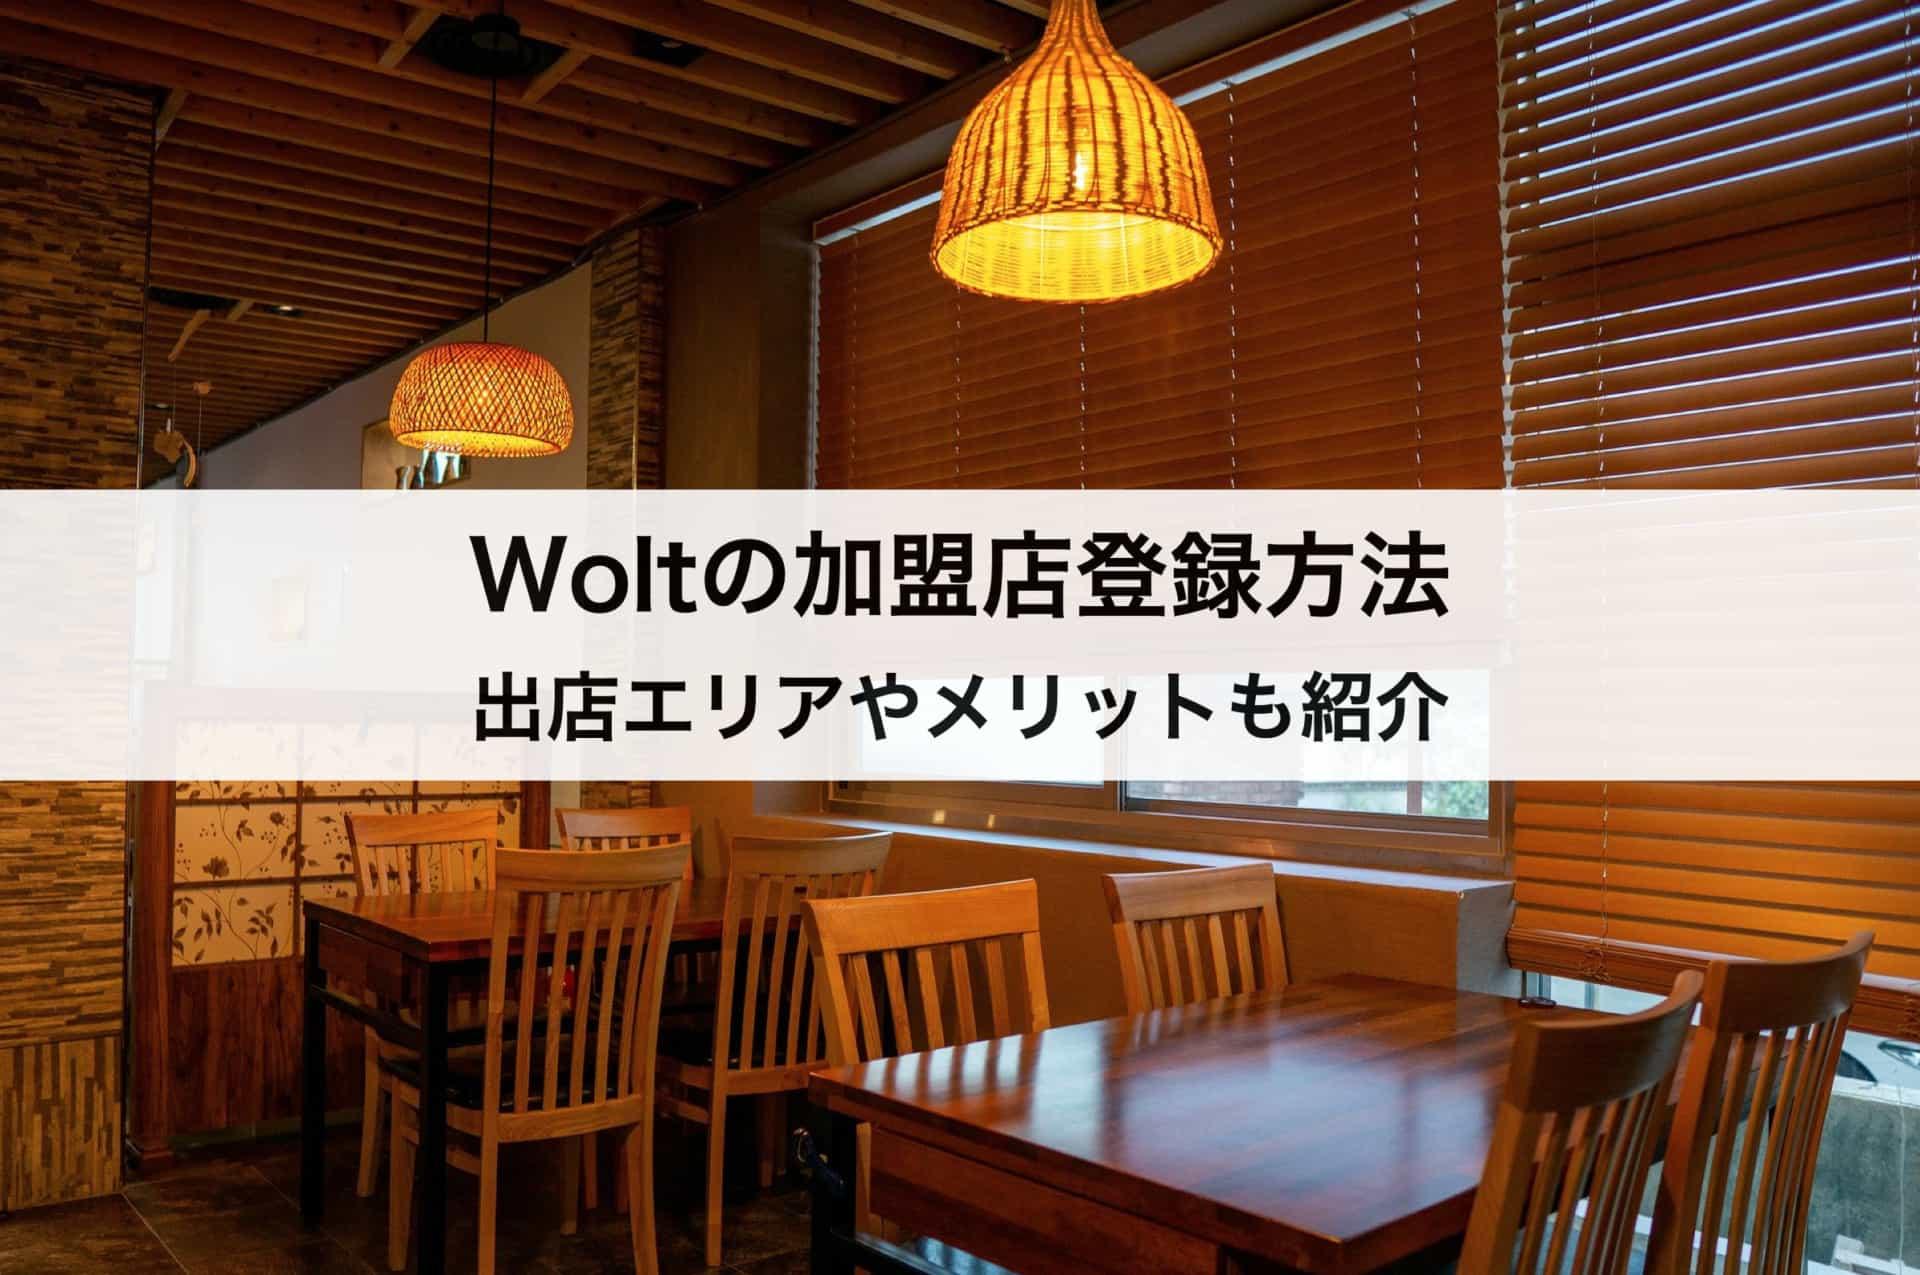 Wolt(ウォルト)の加盟店登録方法|出店エリアやメリットも紹介します。